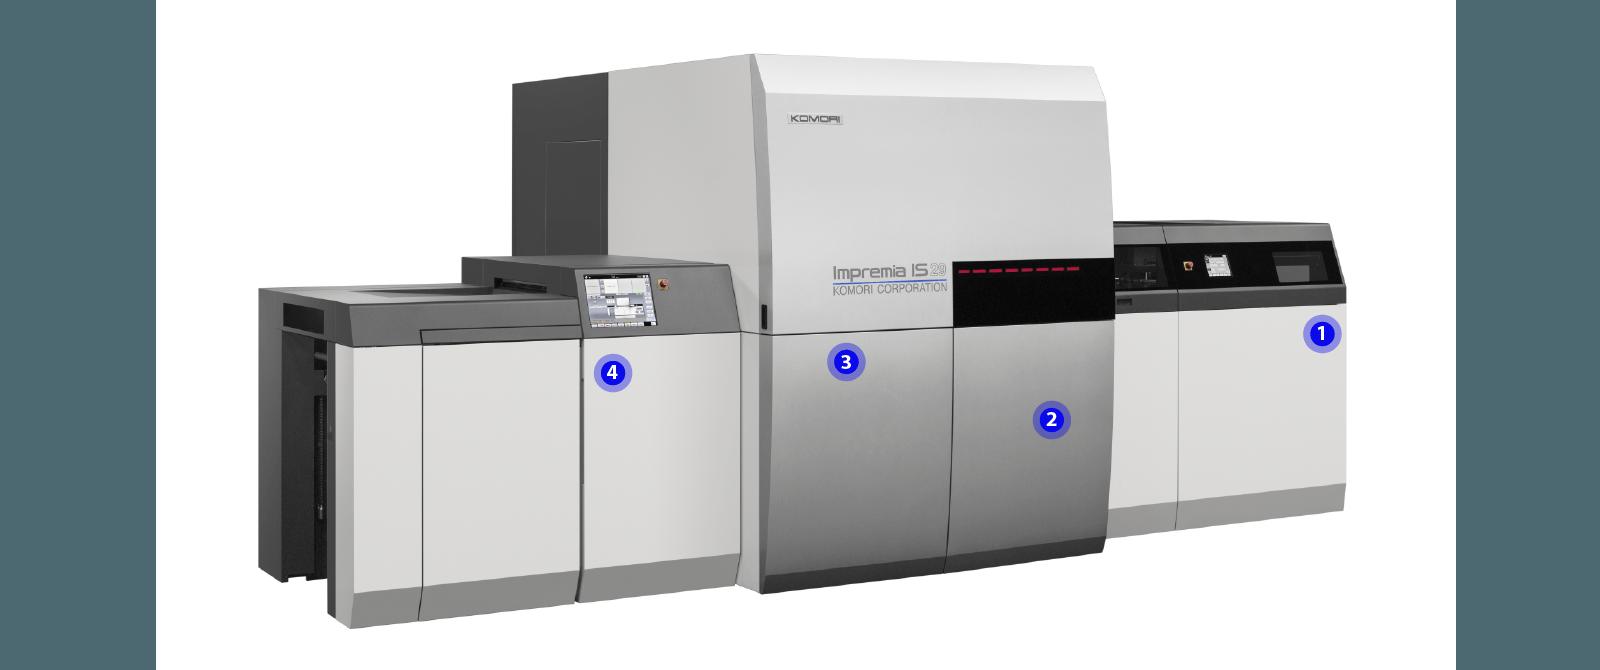 komori printing machine service manual